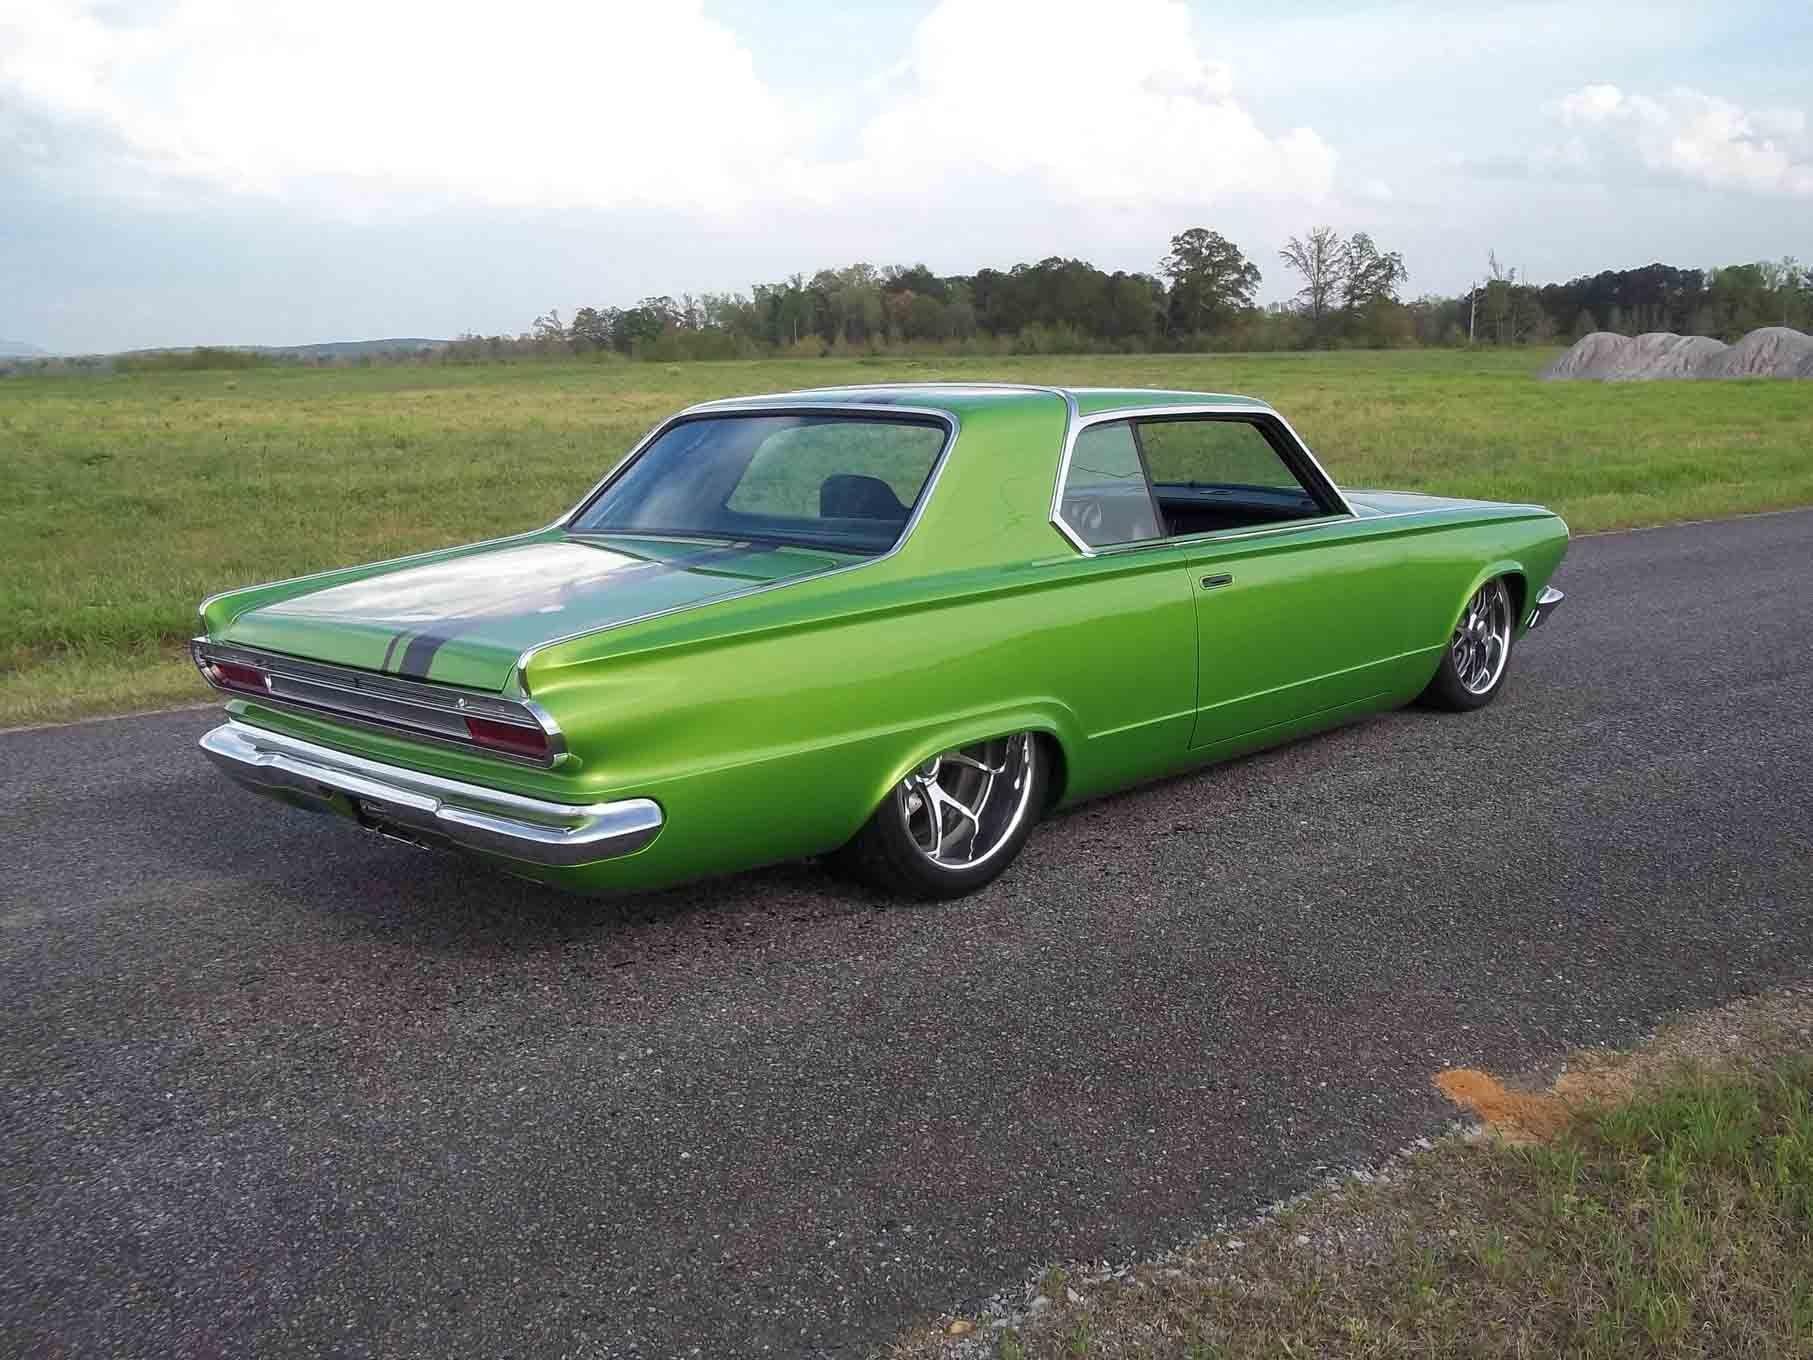 1965 dodge dart coupe hardtop street machine pro touring green usa 12 wallpaper 1813x1360 761603 wallpaperup